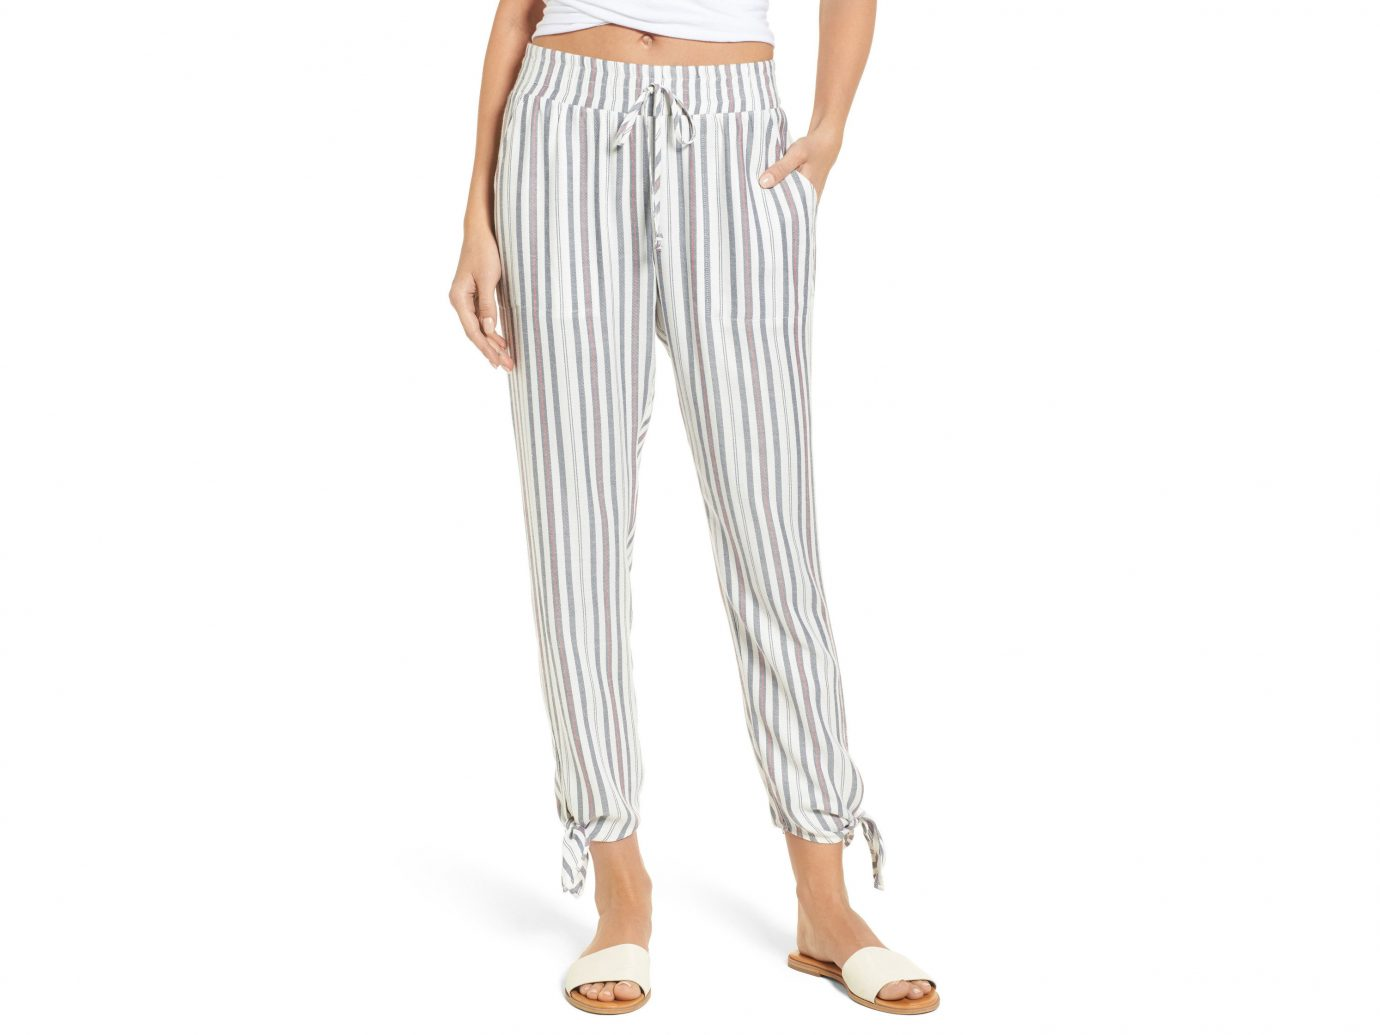 Style + Design Travel Shop clothing white active pants waist trunk leg abdomen trousers jeans joint human leg trouser